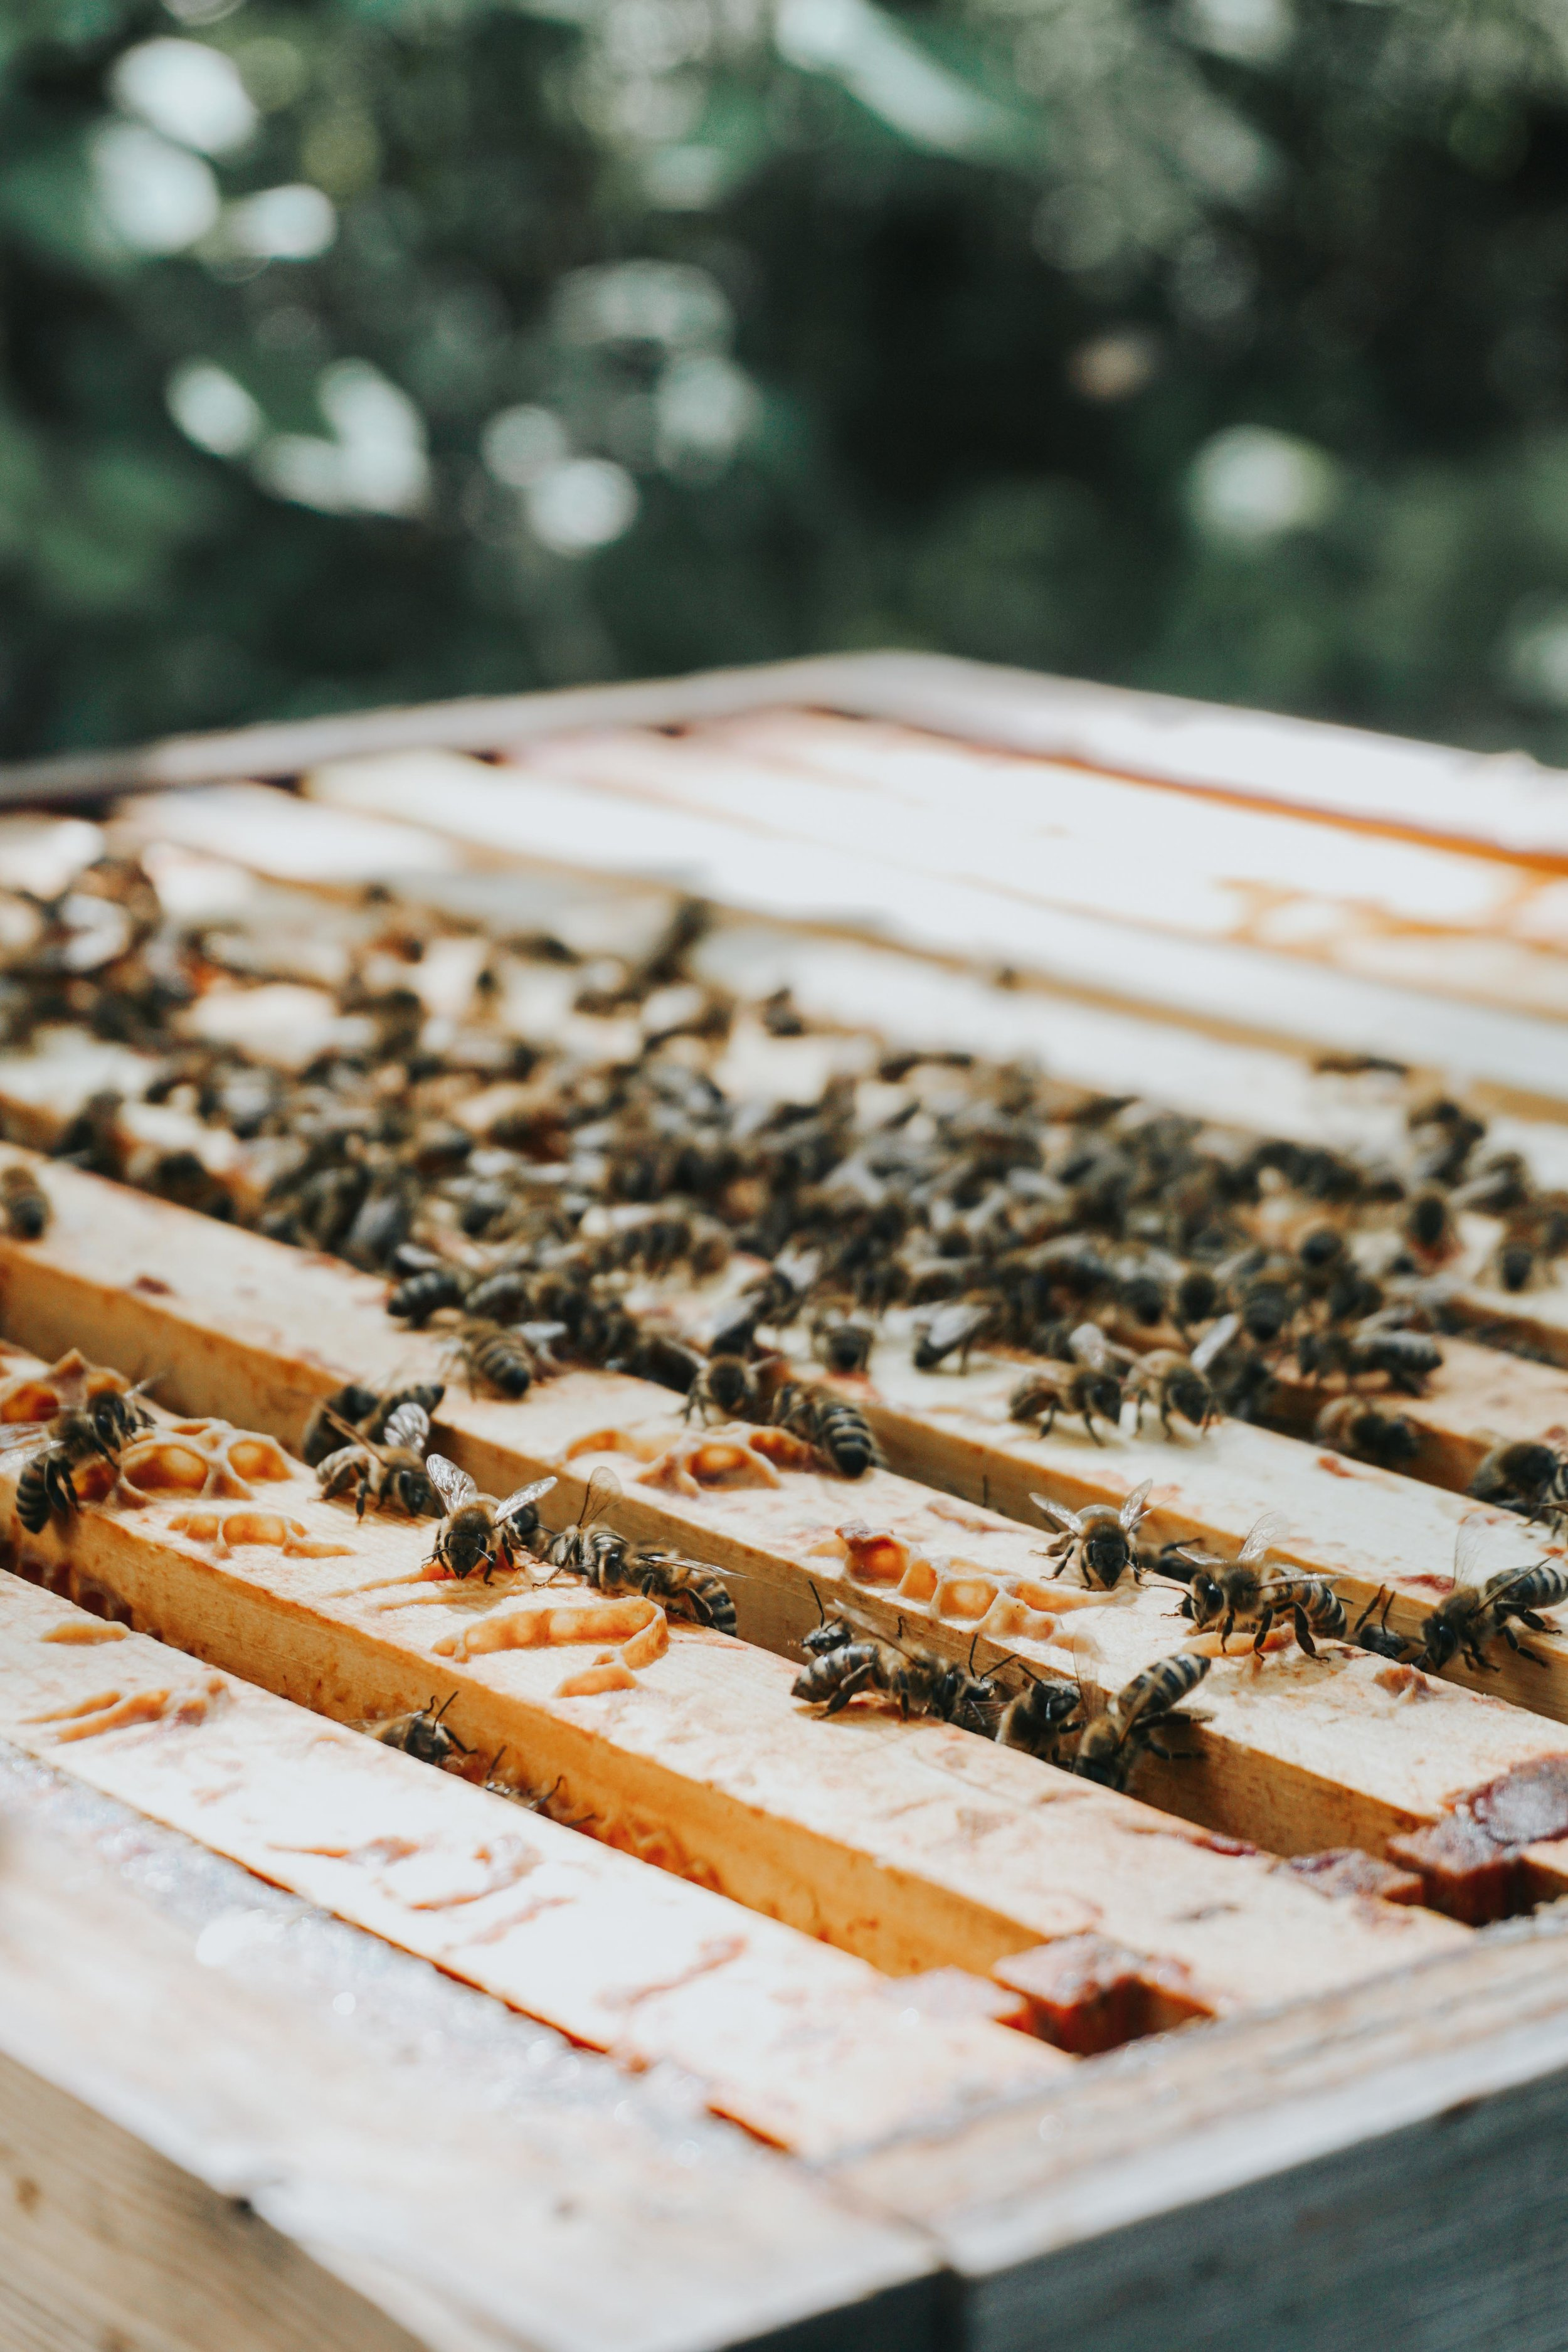 Nordic Honey_Organic Honey_Organic beekeeping_Beekeepers_Bees collecting nectar_Pure Raw Honey_Beehives_Honeycomb